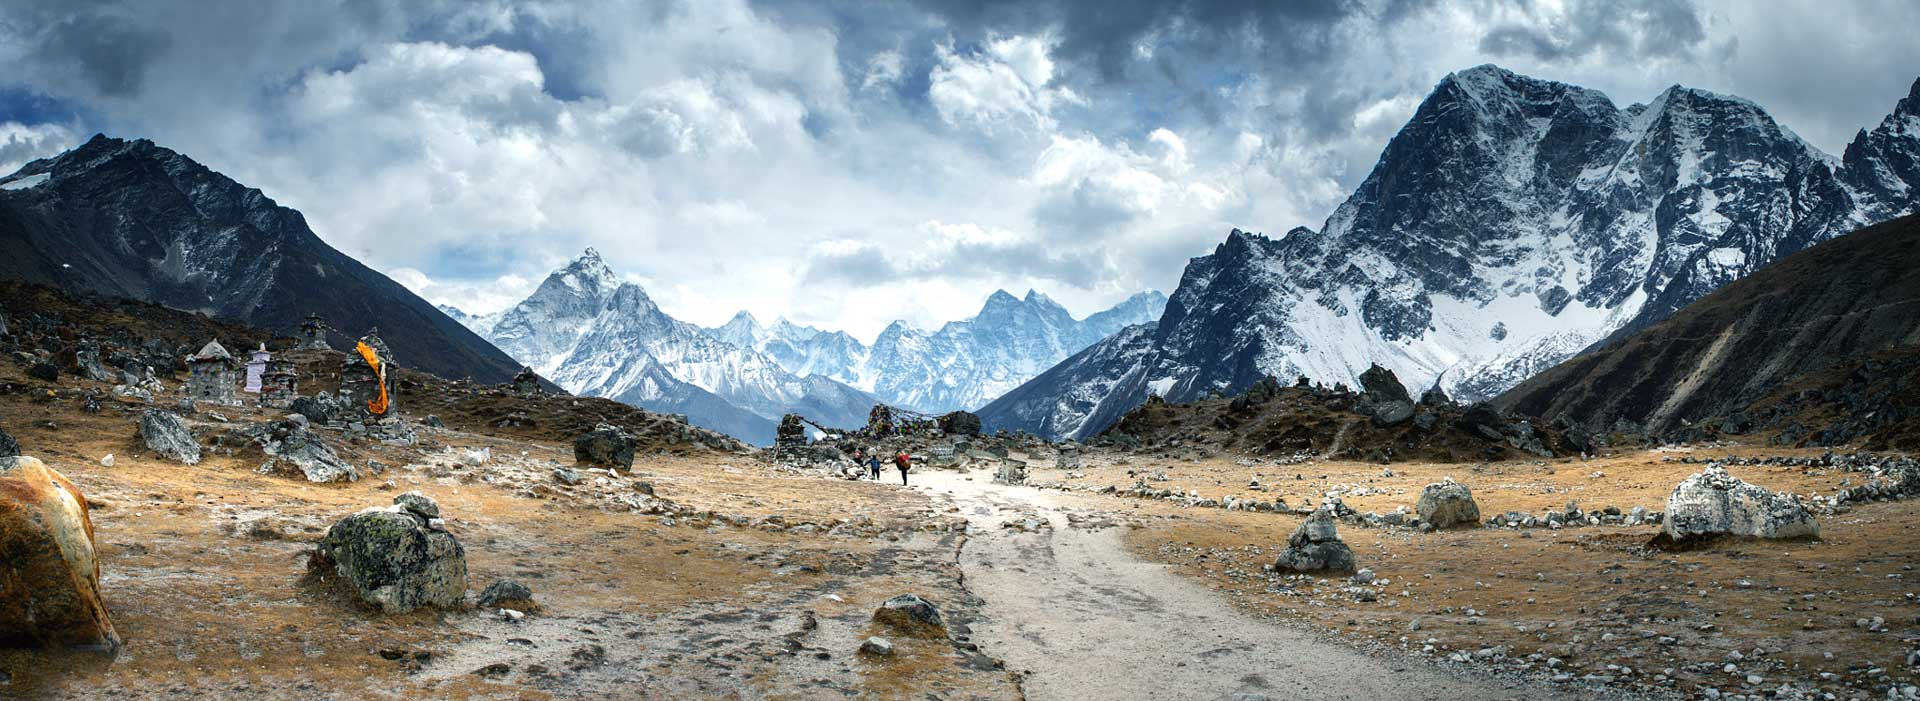 Everest Base Camp Trekking FAQs